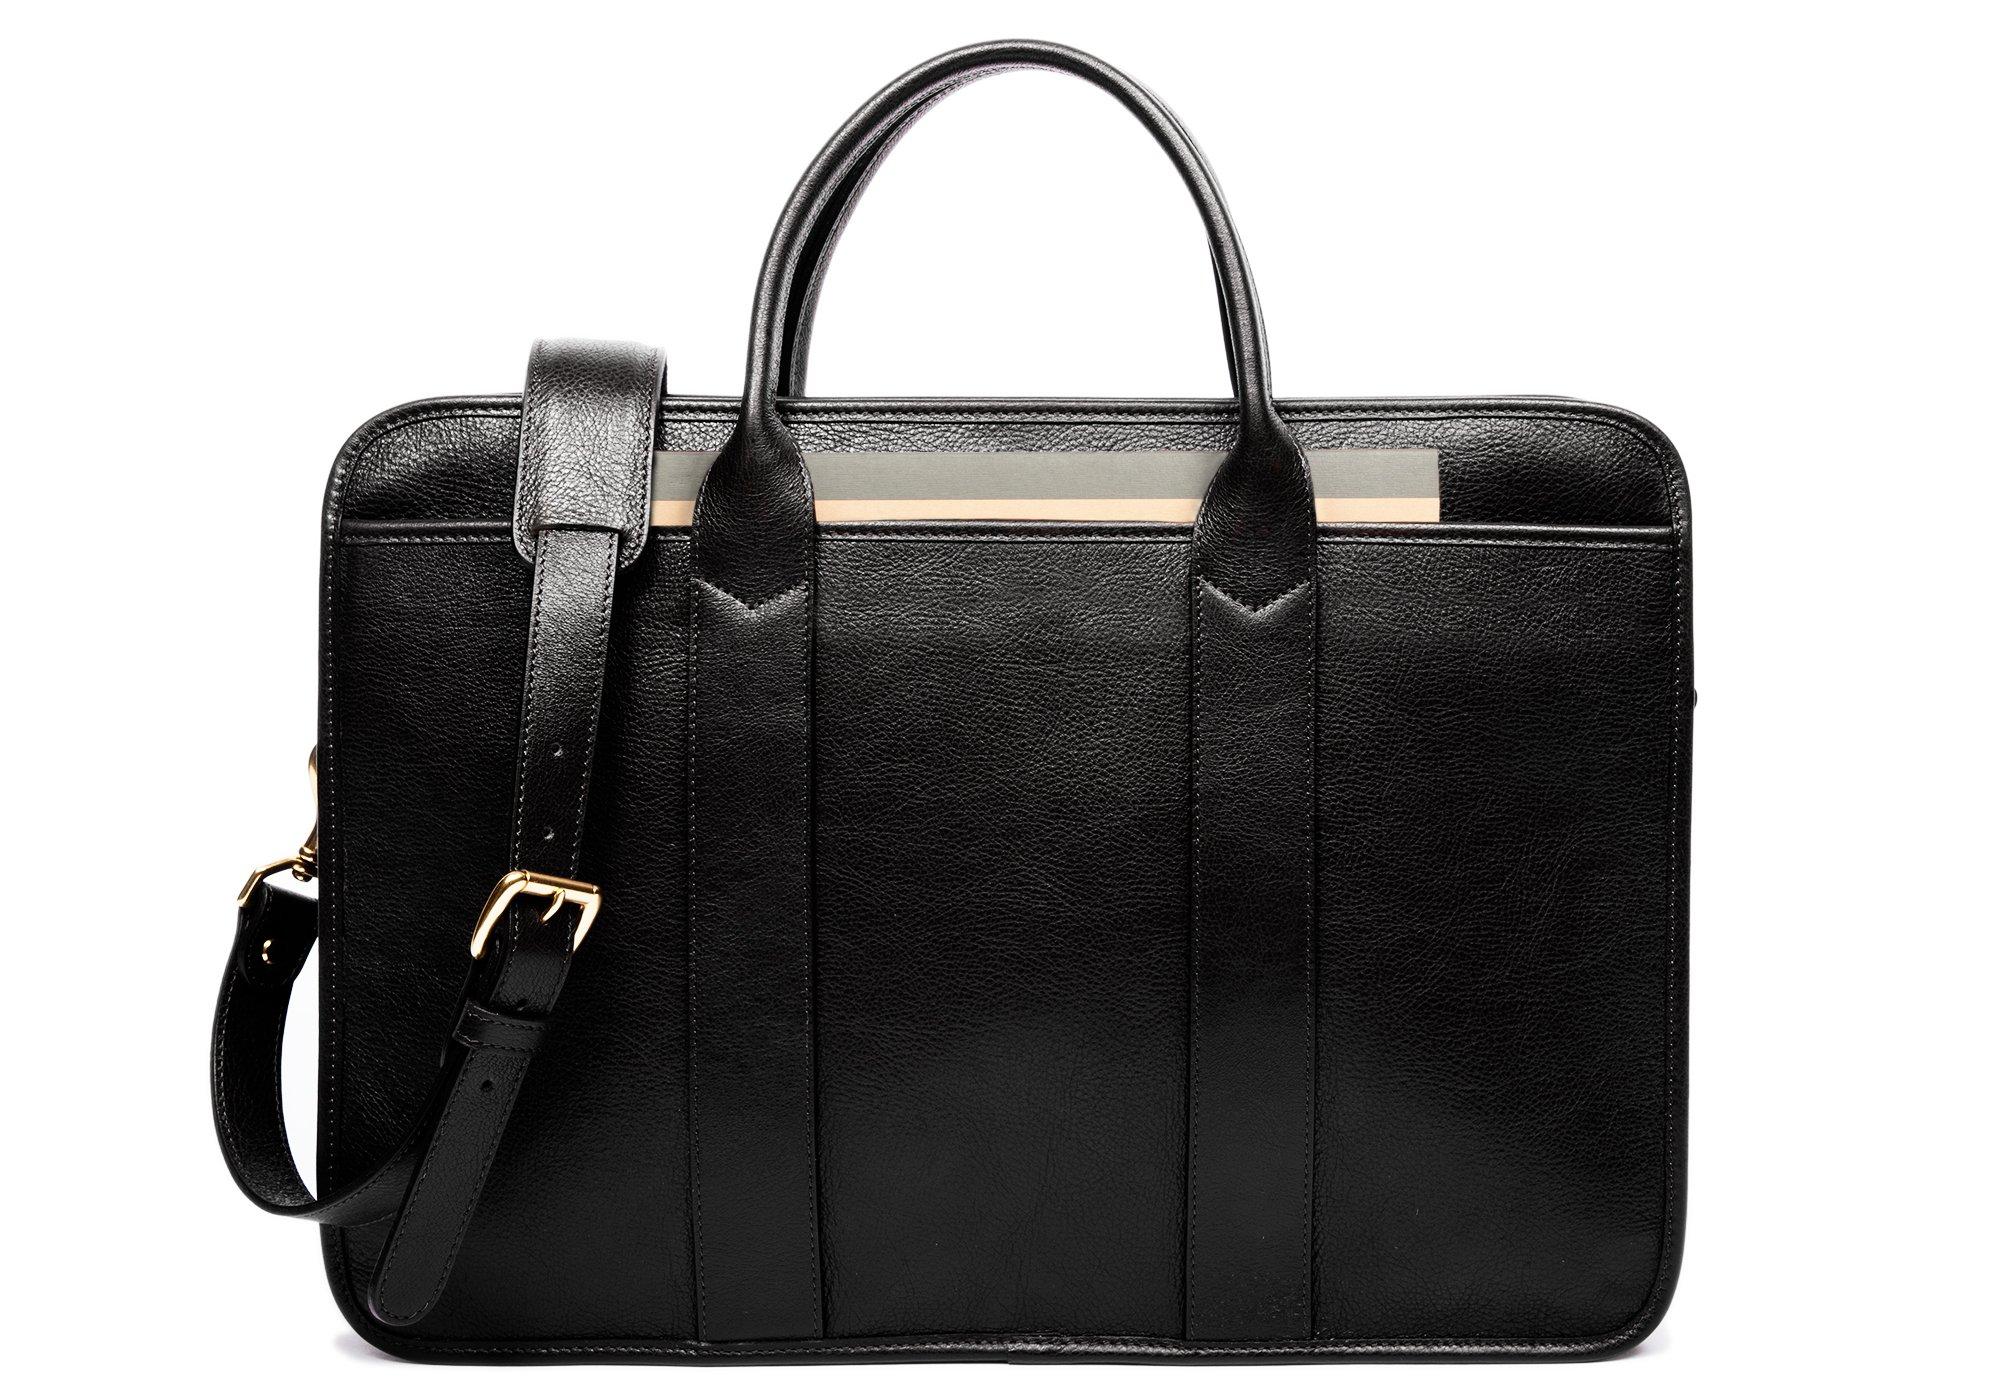 Lotuff_Leather_Zip_Top_Briefcase_II_Black_11_2000x.progressive